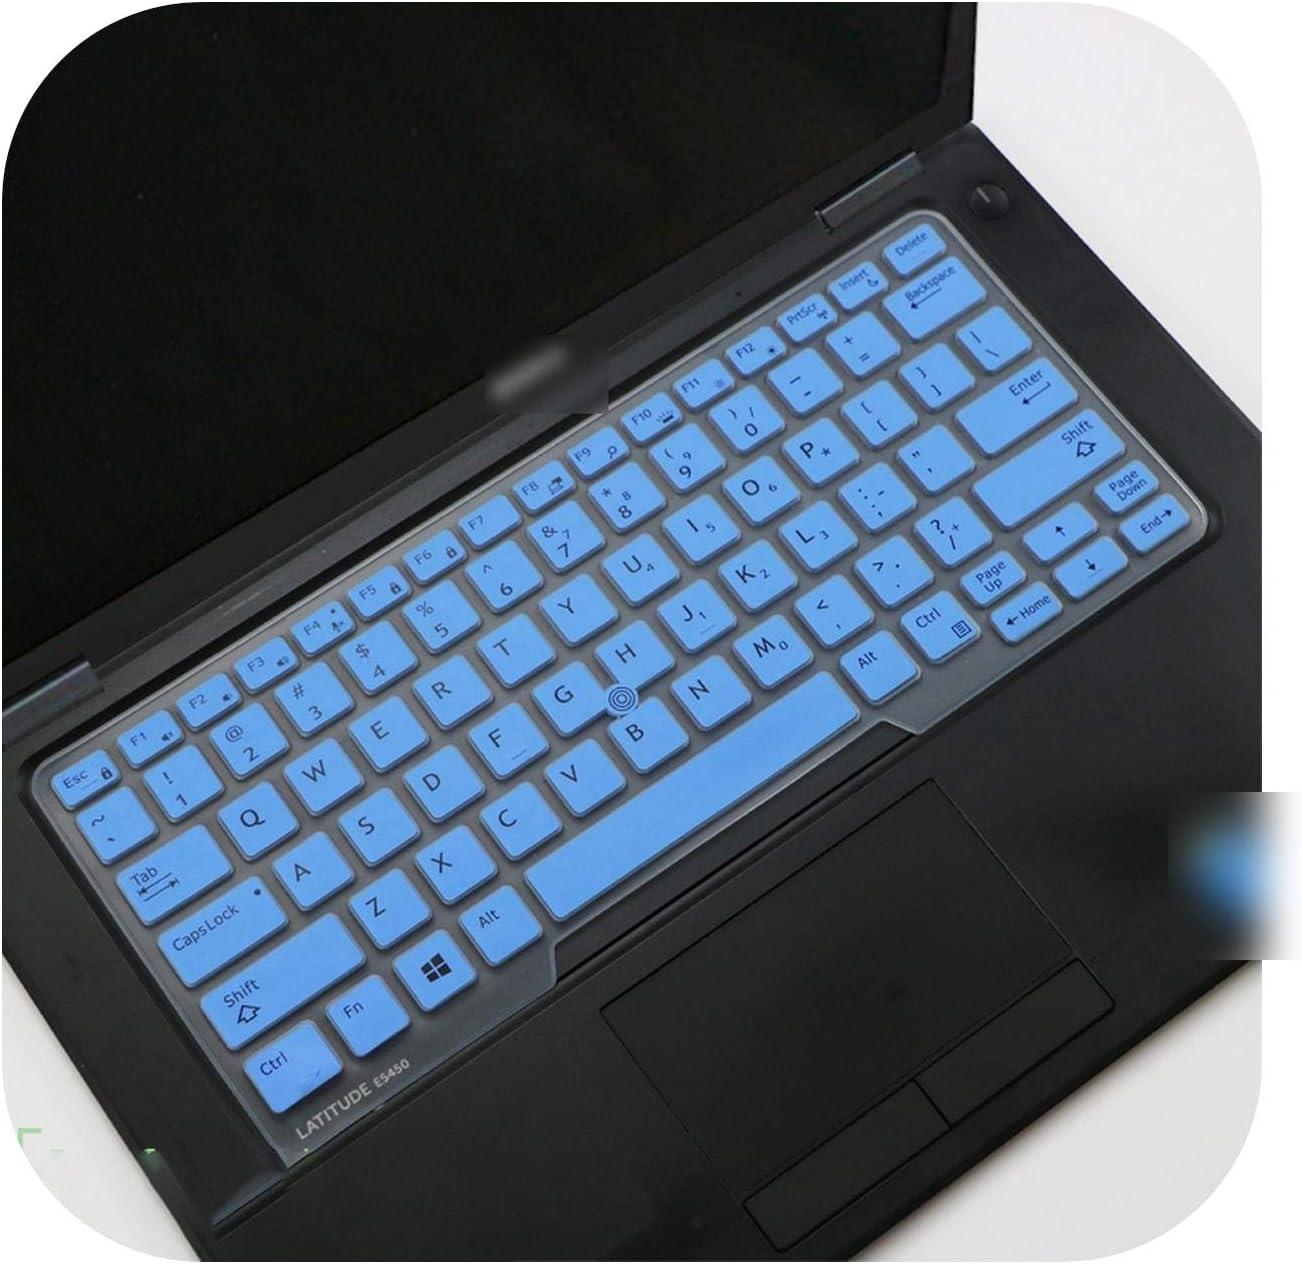 Film Pour Clavier Laptop Keyboard Cover Skin for Dell Latitude 5480 5490 7490 3340 E3340 E5490 5491 E5491 E5450 E5470 E7450 E7470 7480 E7480-Blue-